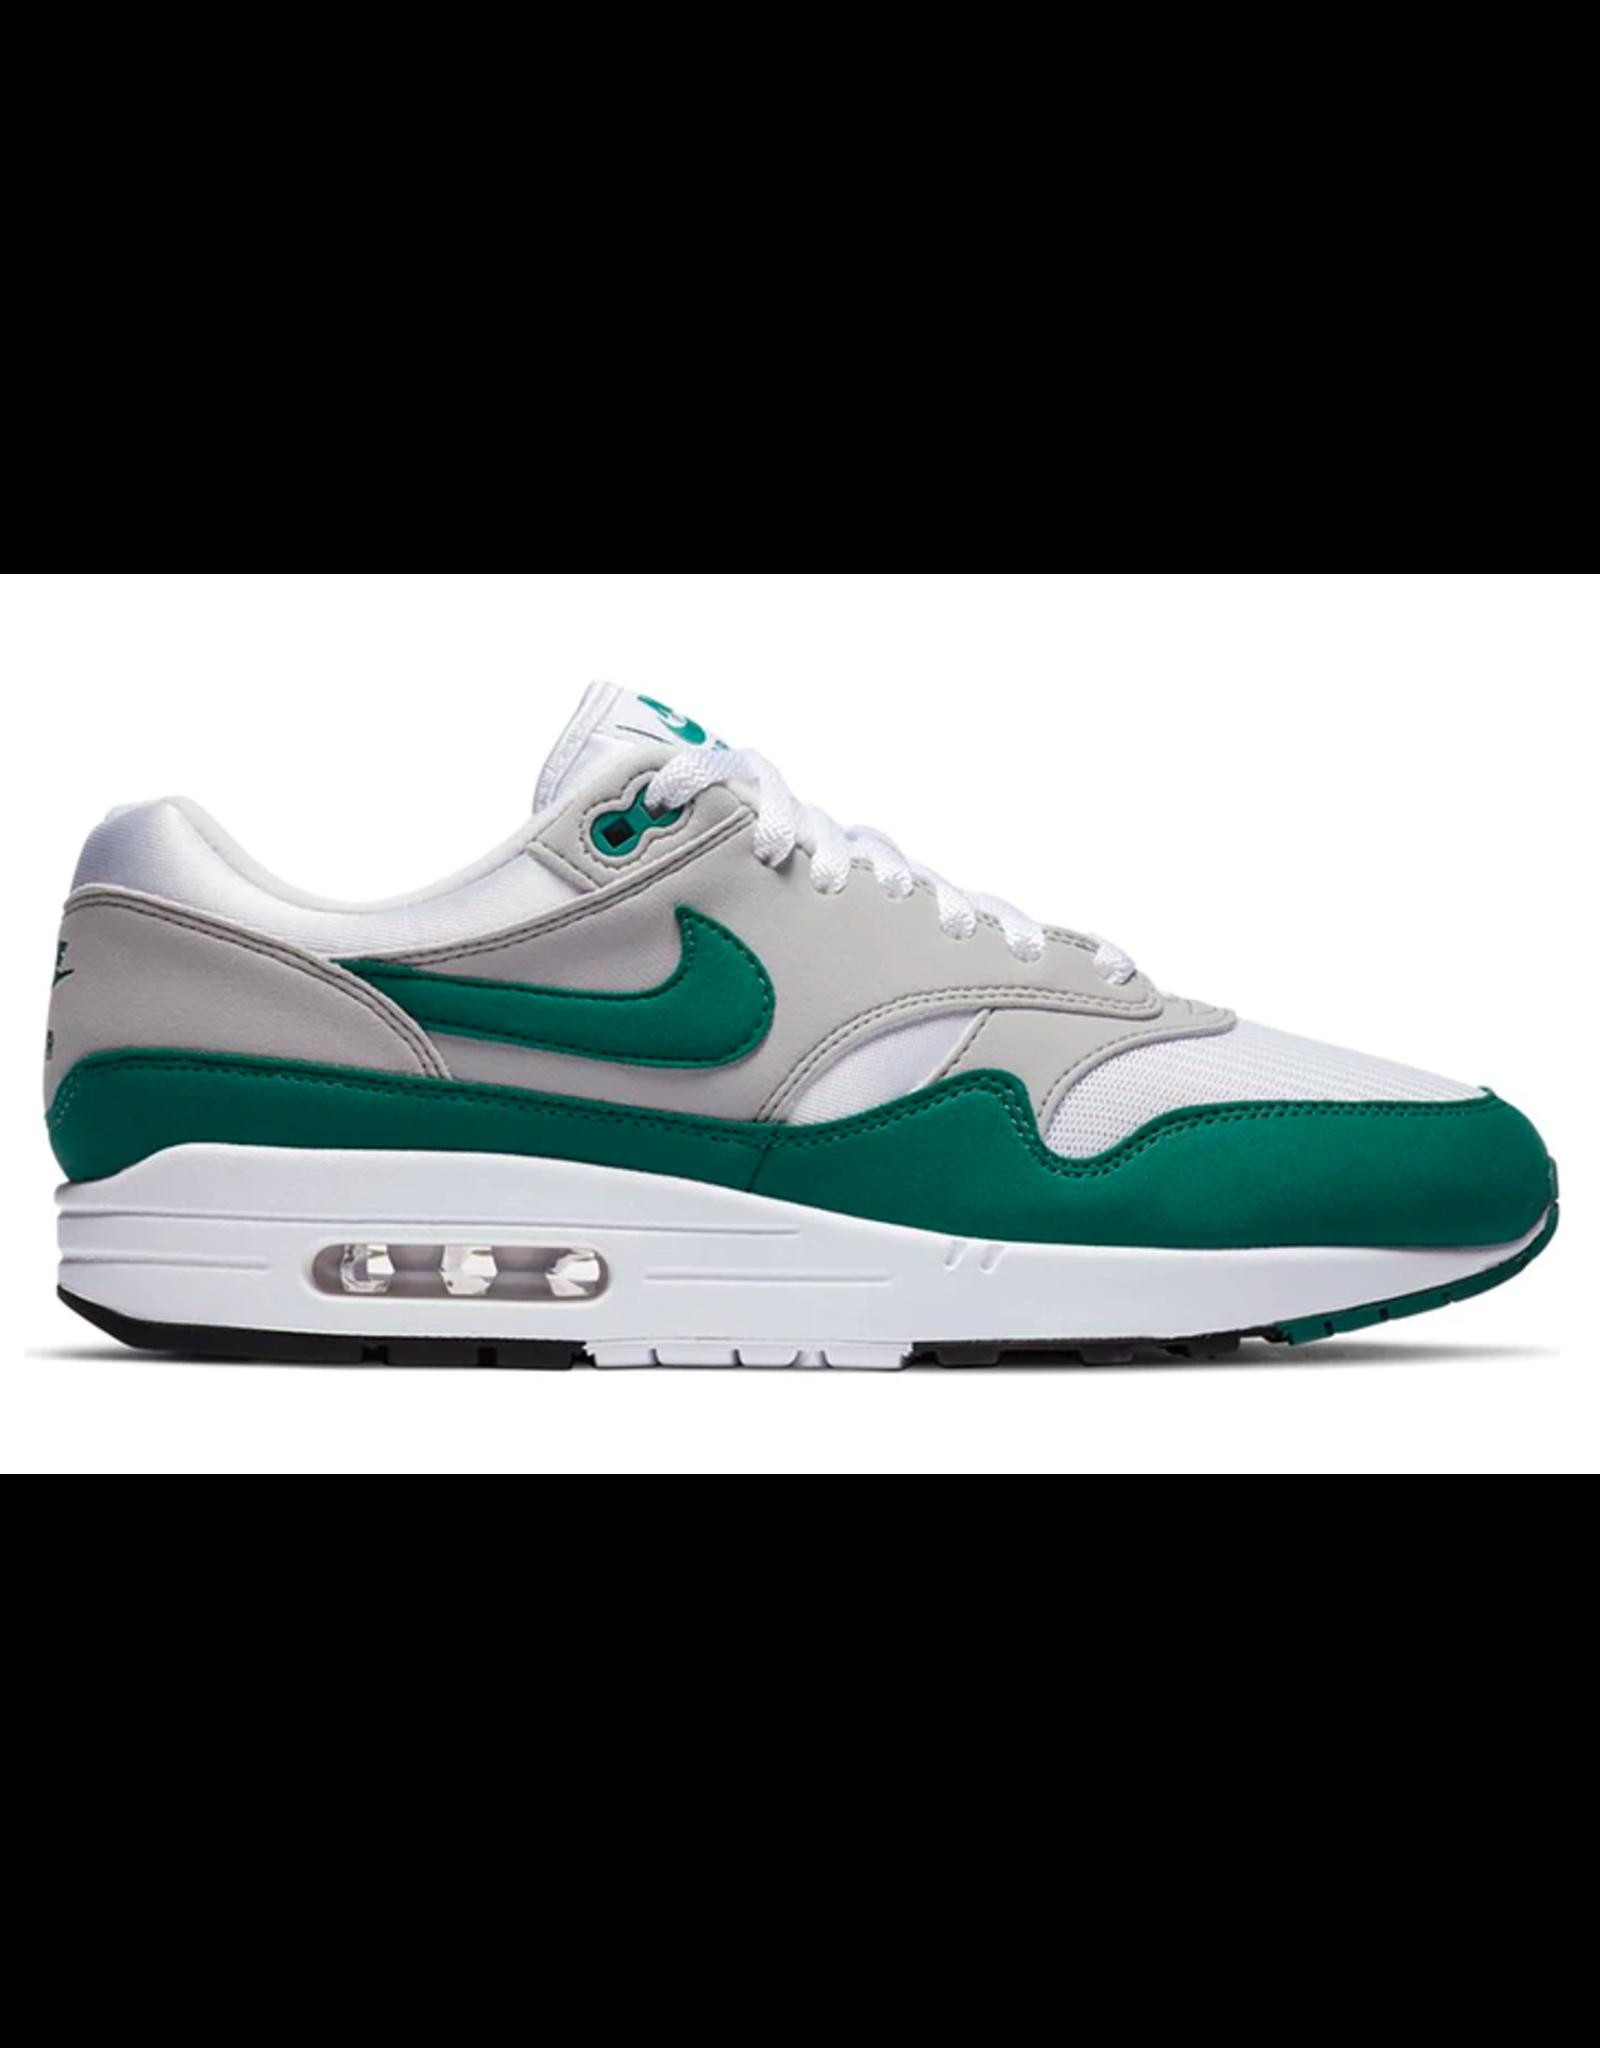 SUPREME Nike Air Max 1 Anniversary Green (2020)